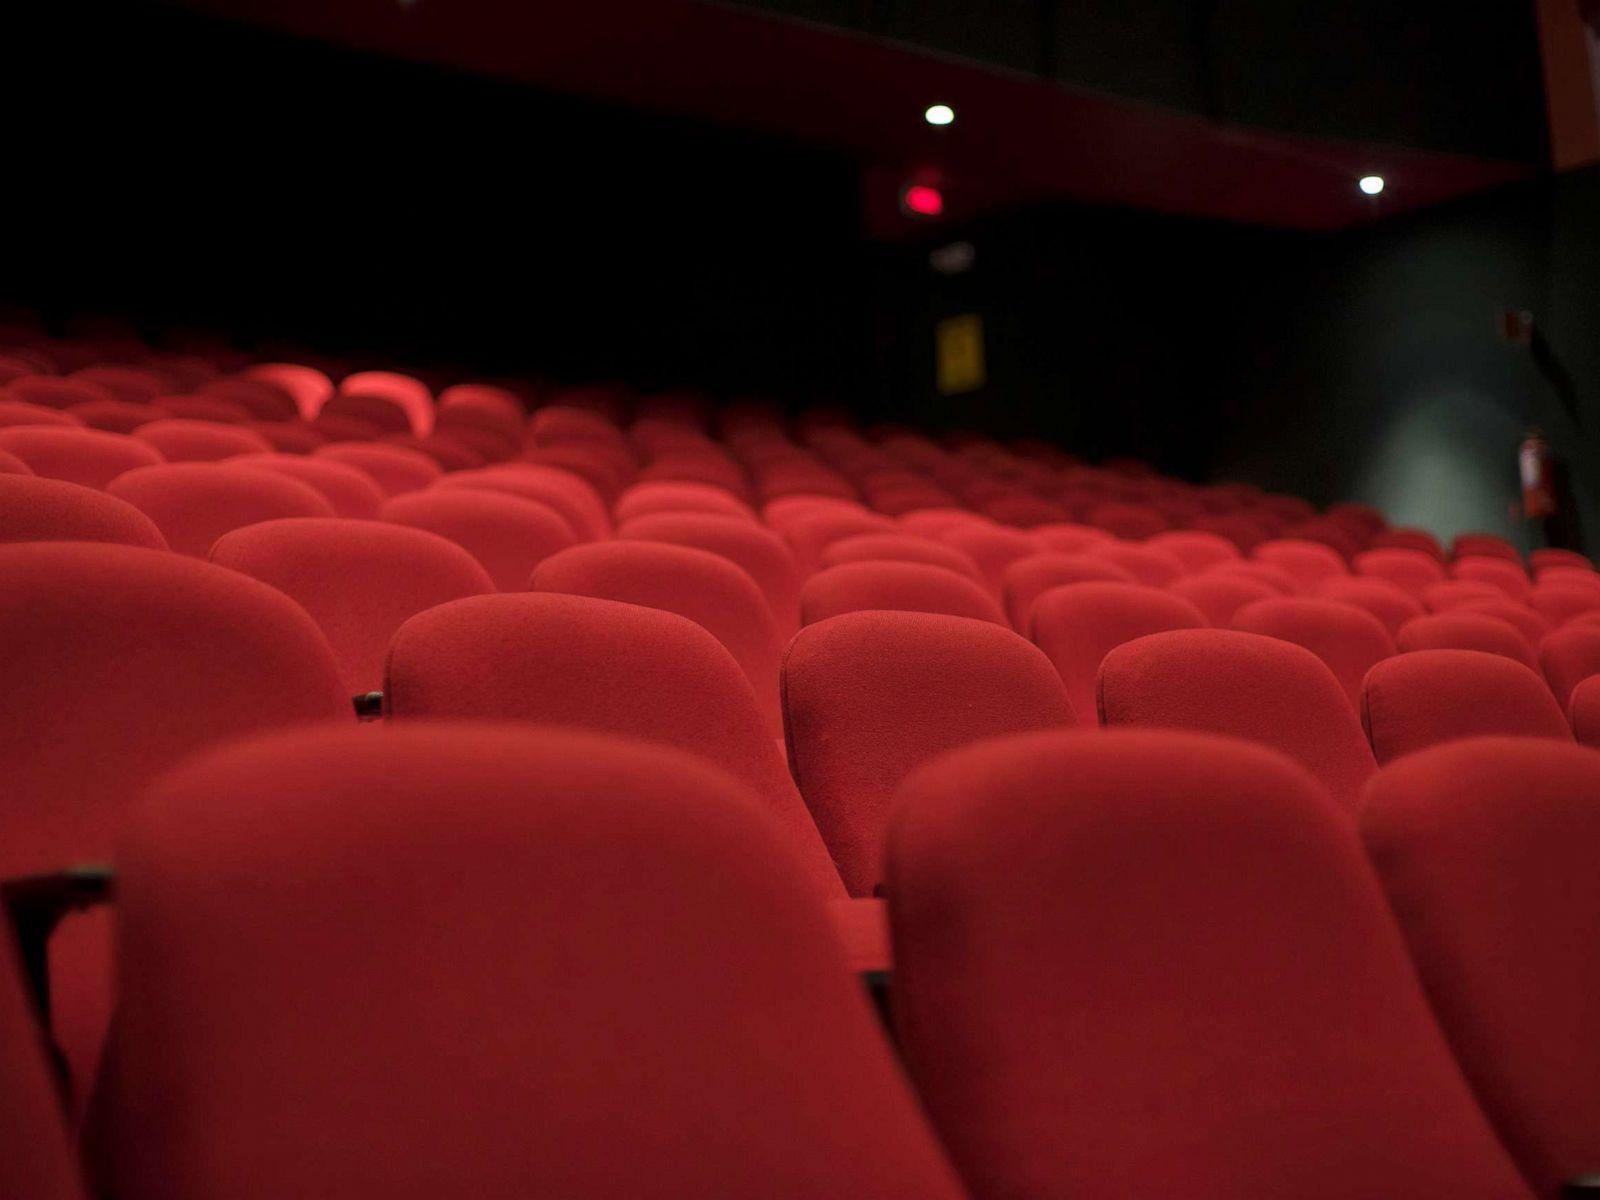 Joker Movie Prompts Mass Shooting Threat At Us Movie